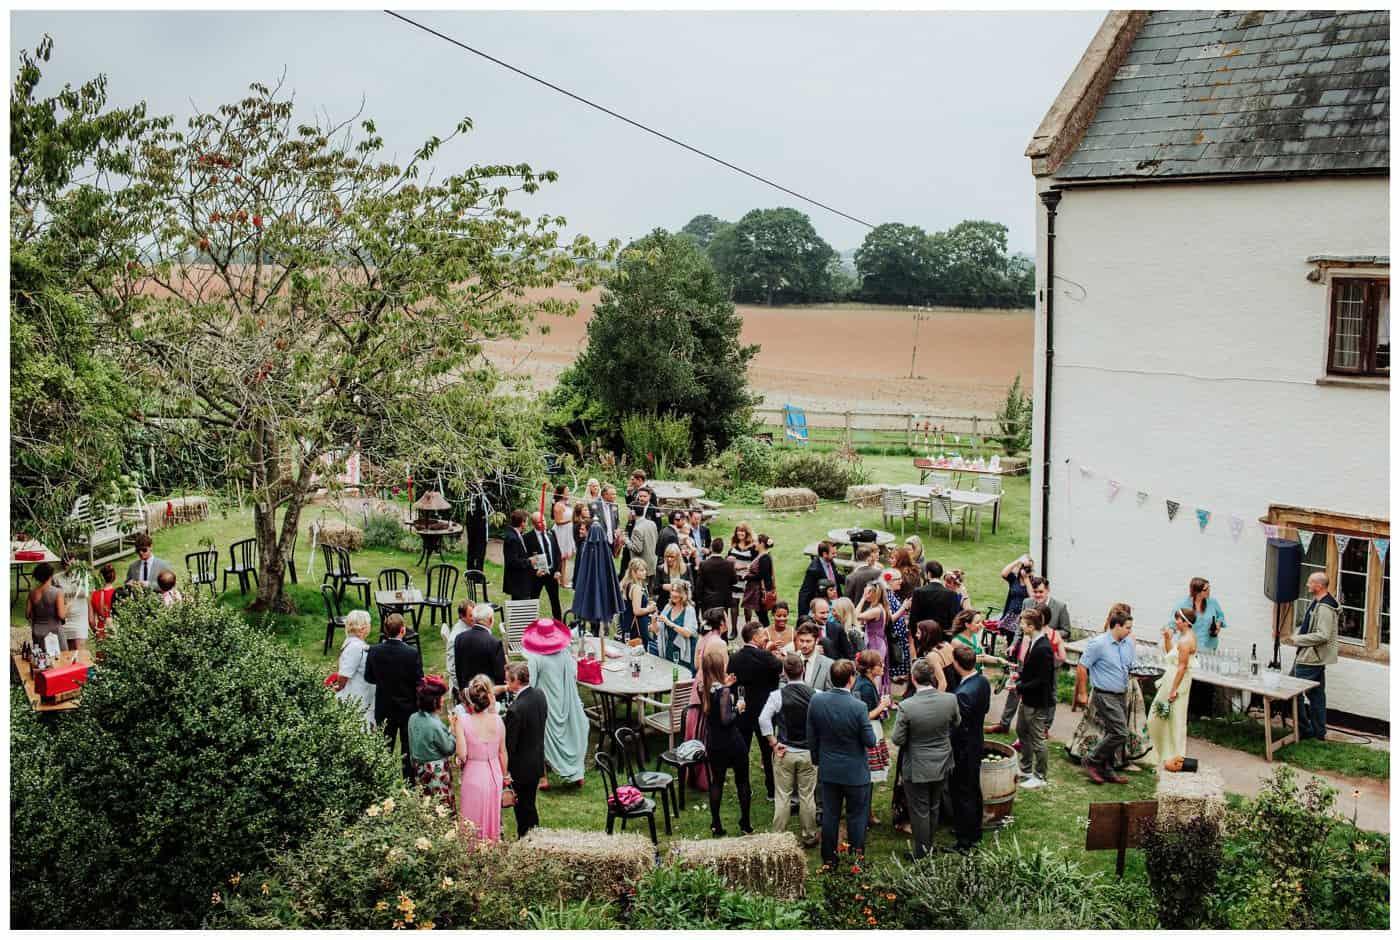 Huntstile Organic Farm Weddings